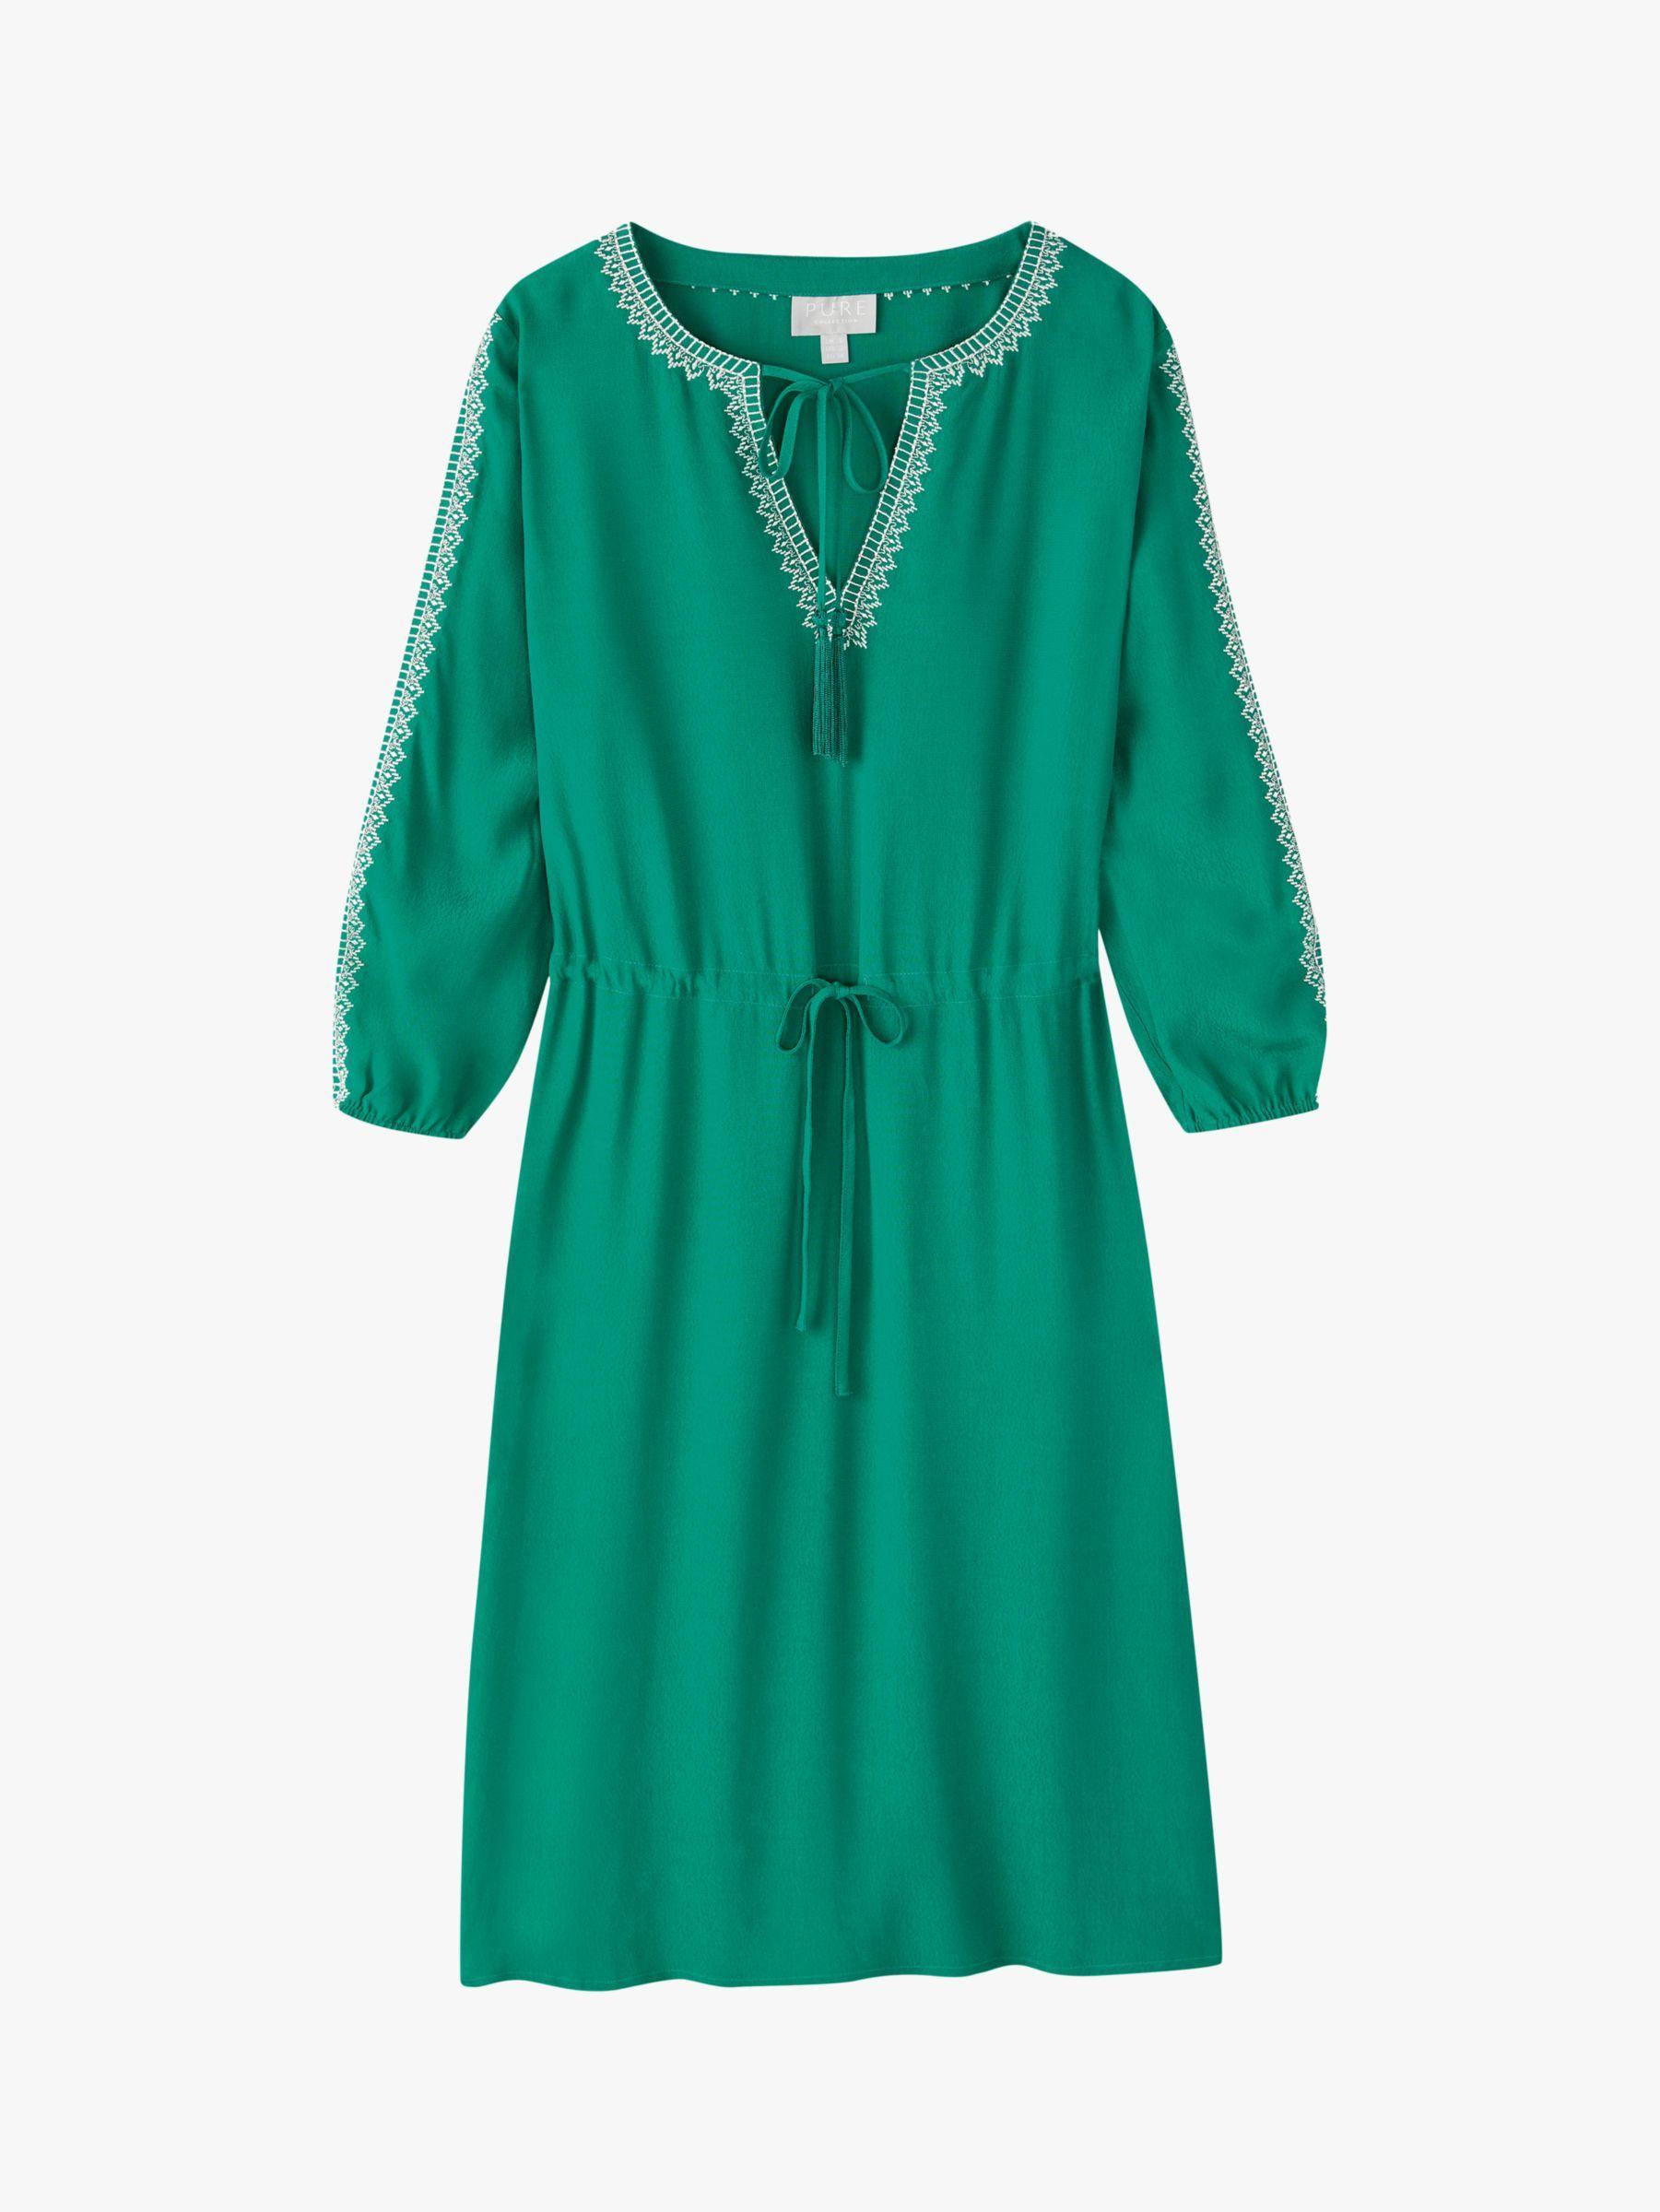 Pure Collection Open Tie Neck Dress, Sage Green #sagegreendress